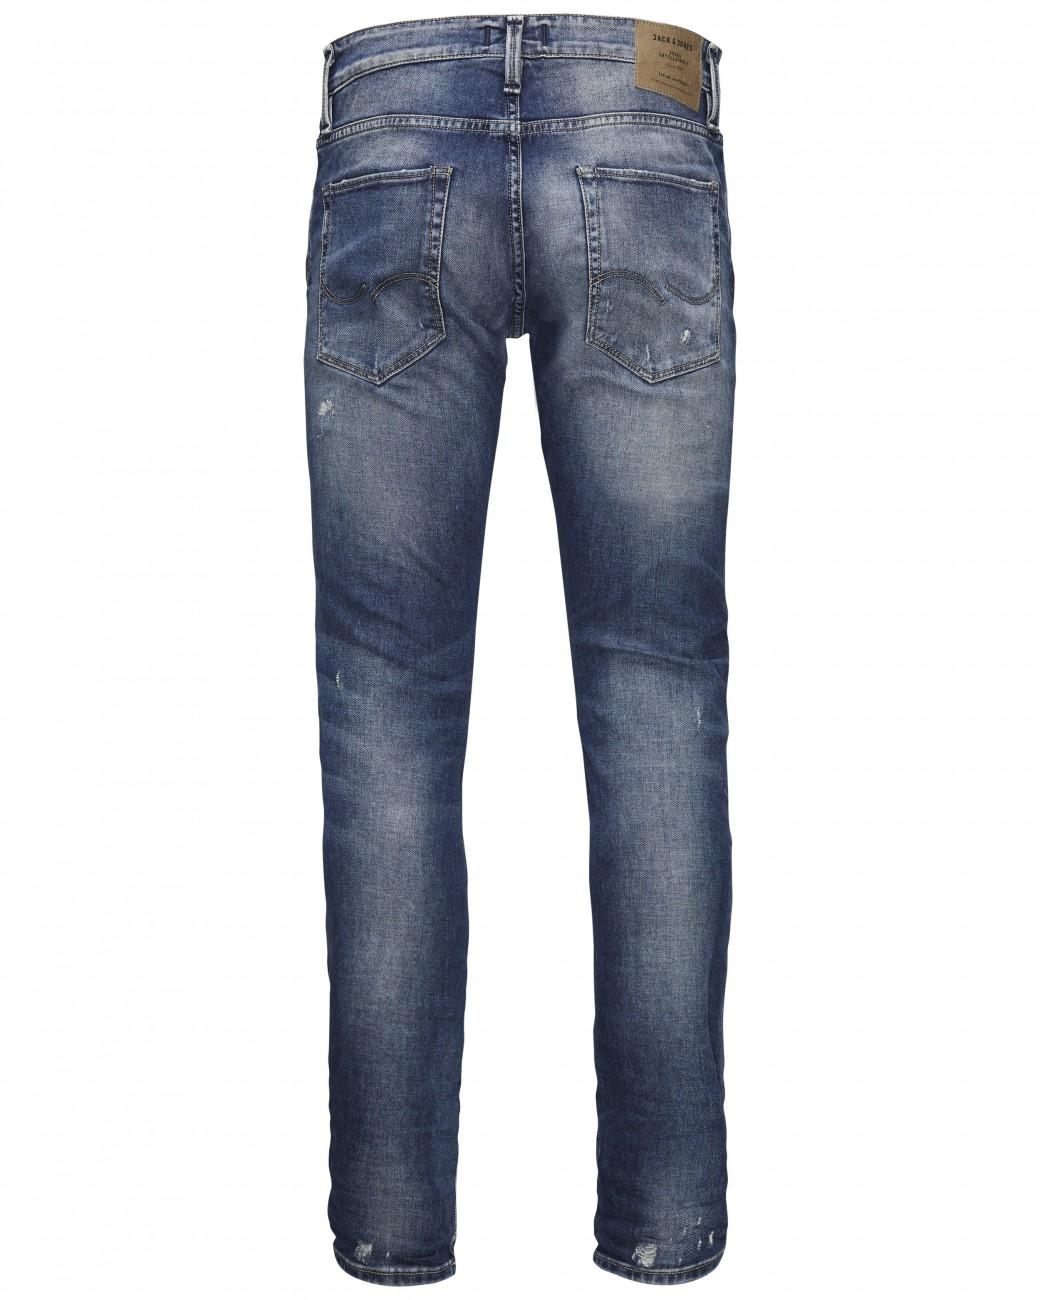 jack-jones-herren-jeans-jjiglenn-jjicon-bl-670-indigo-knit-slim-fit-blau-blue-denim